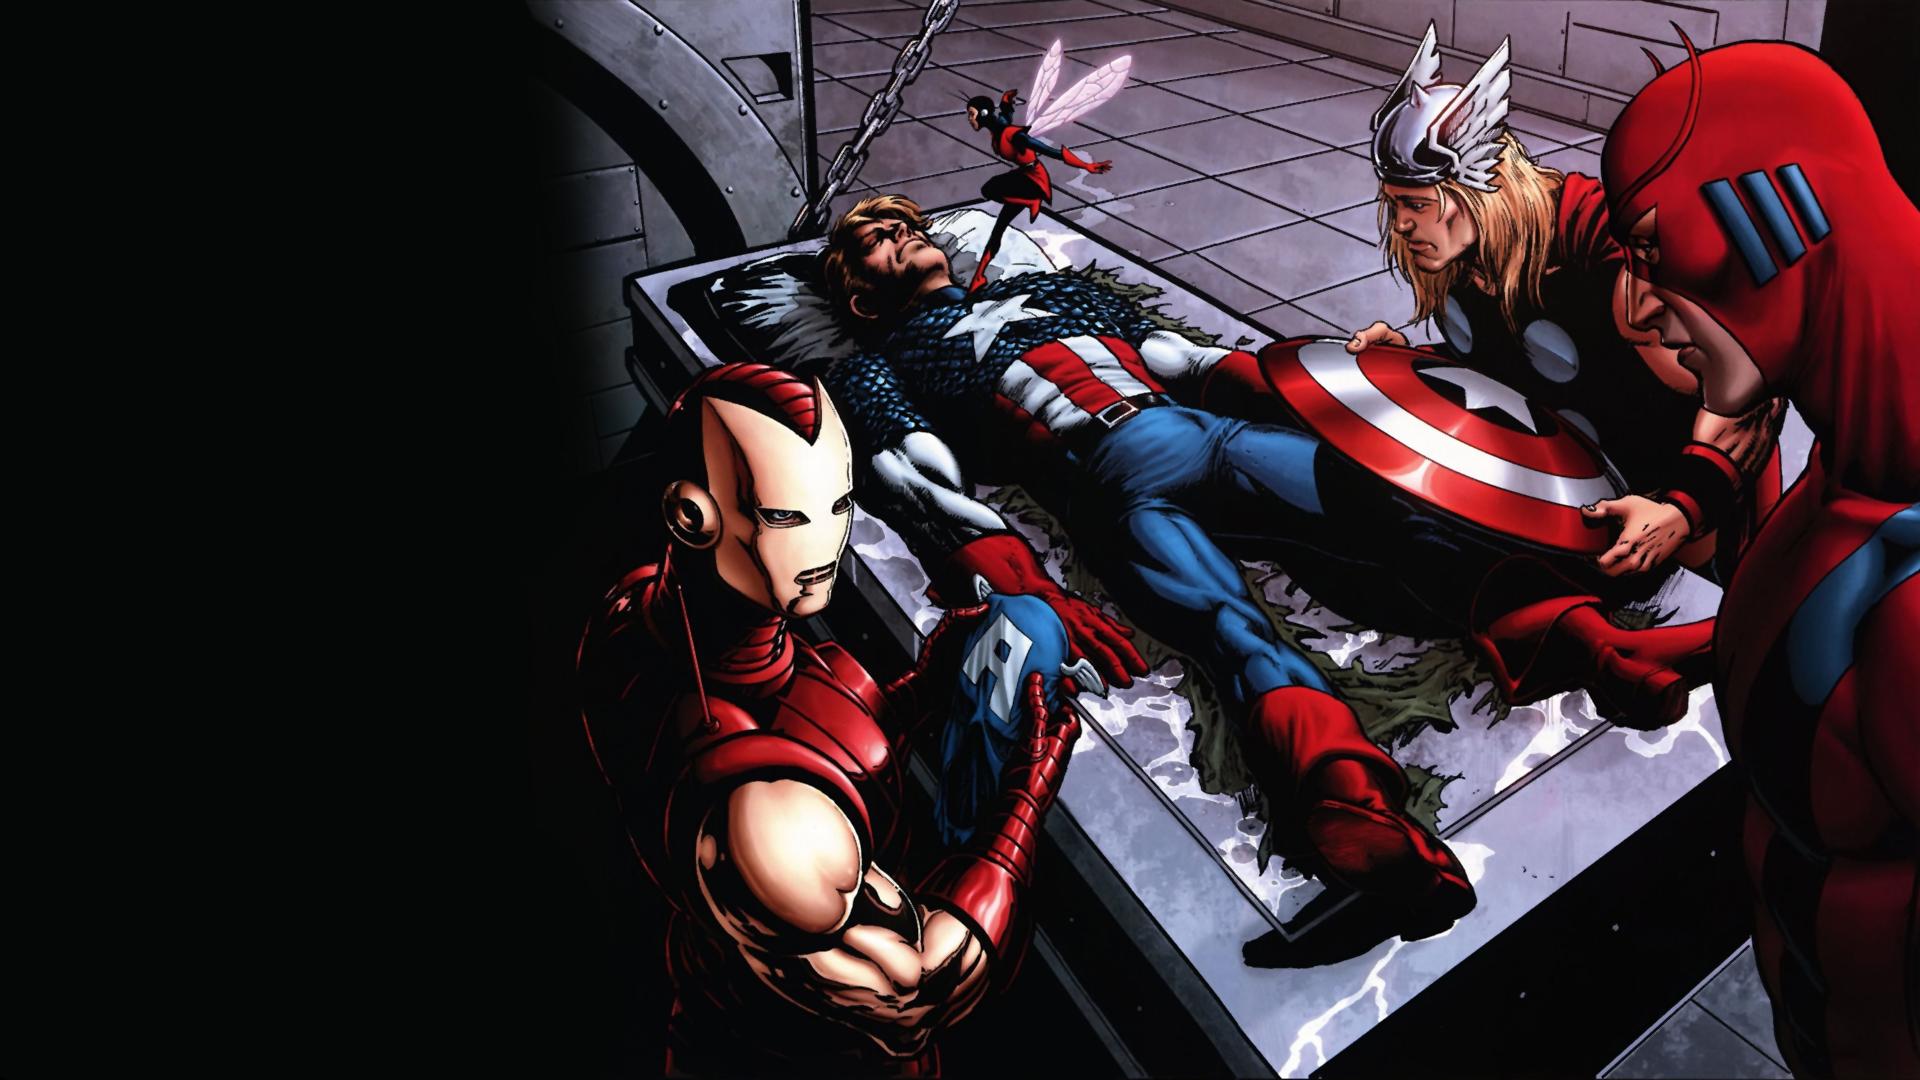 49 Iron Man Captain America Wallpaper On Wallpapersafari